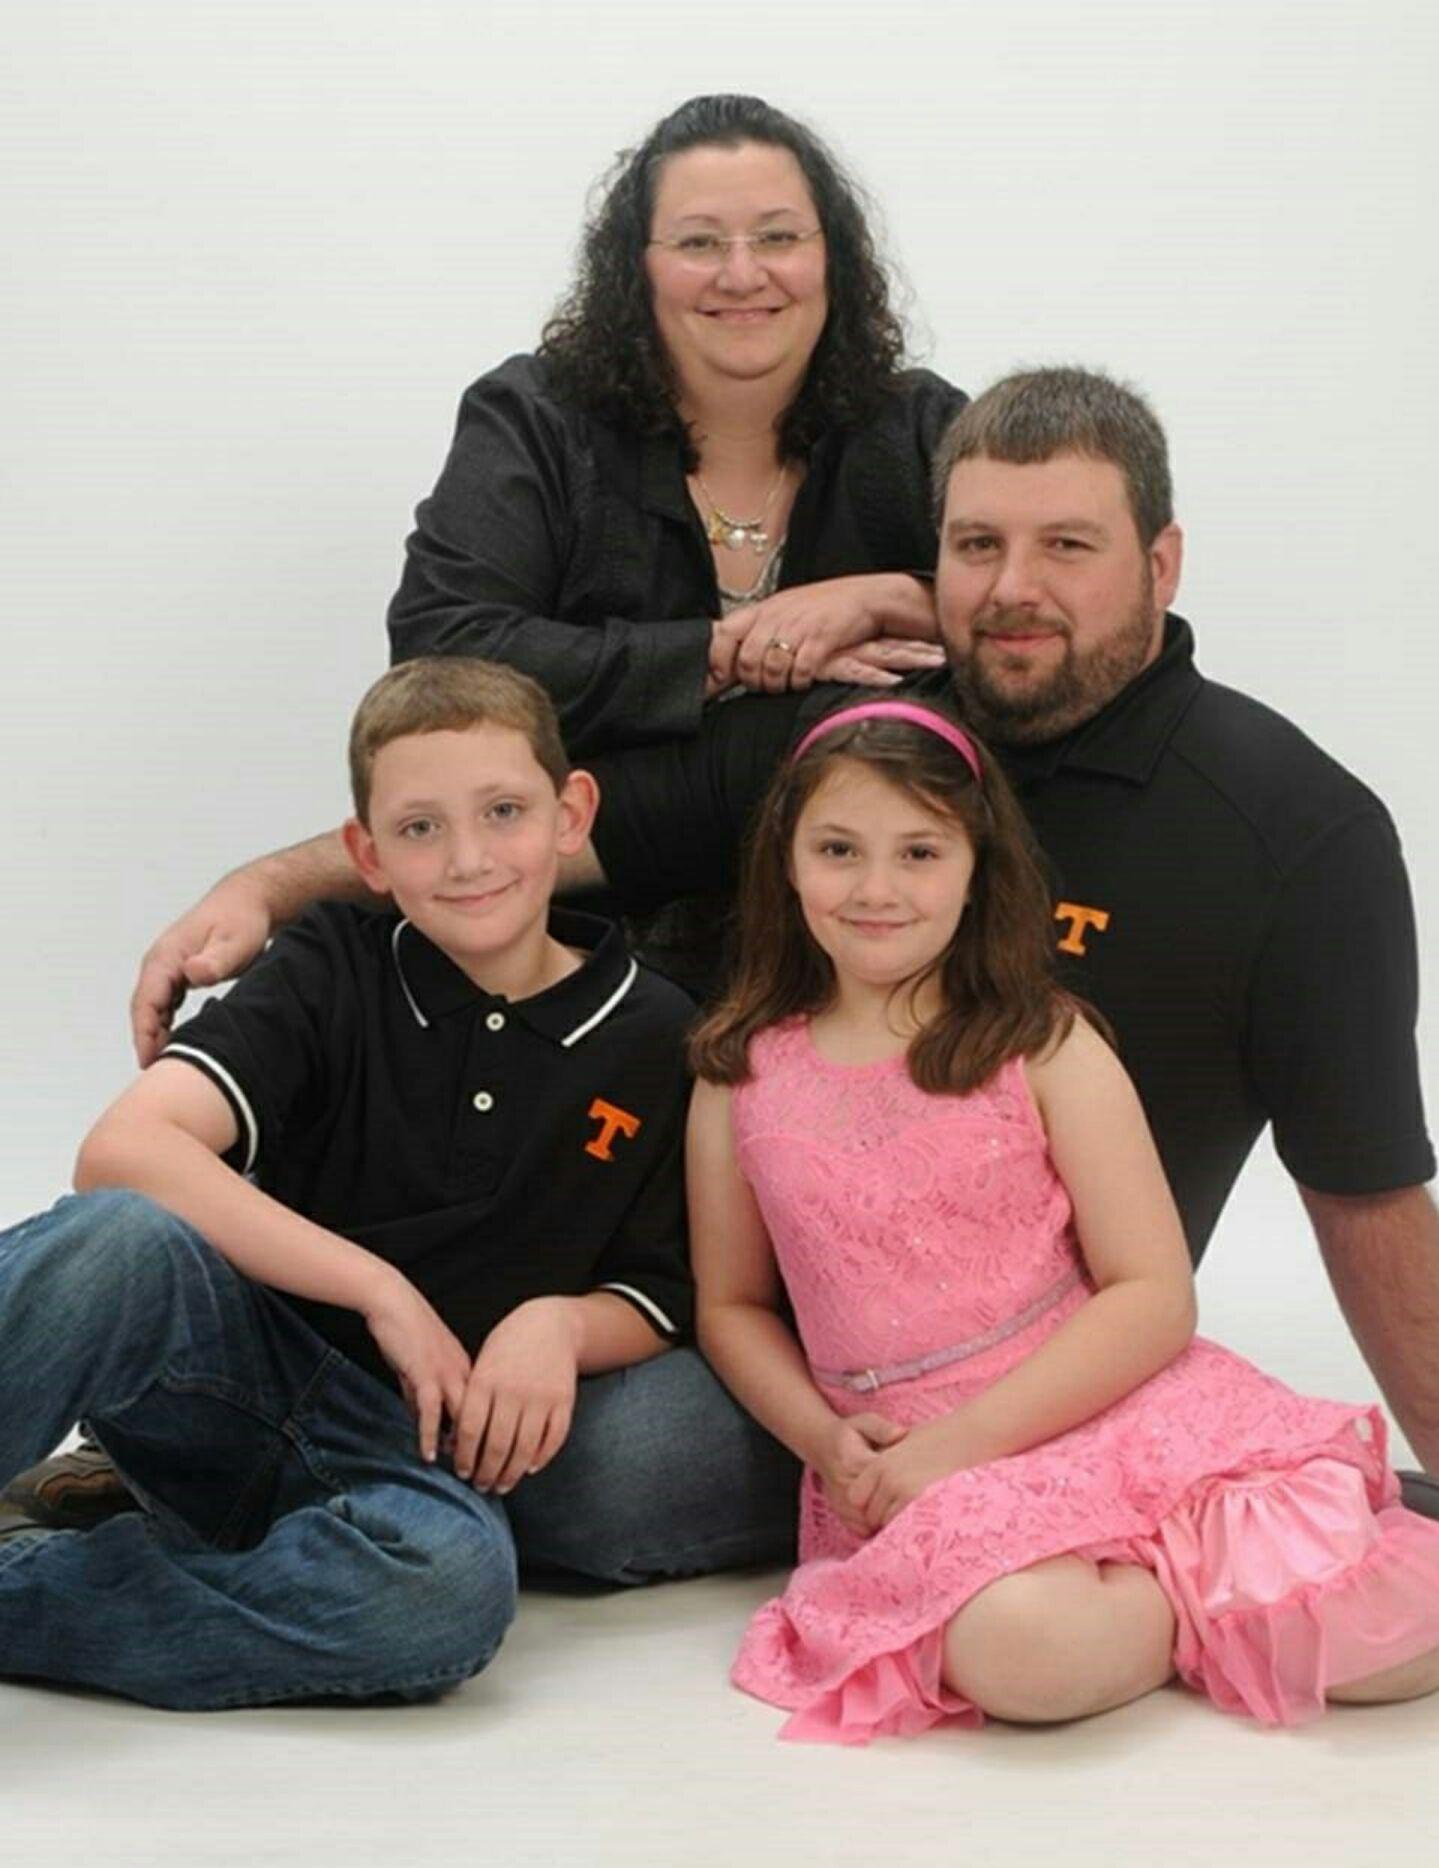 Jeremy, Beth, Cameron, and Grace Fox